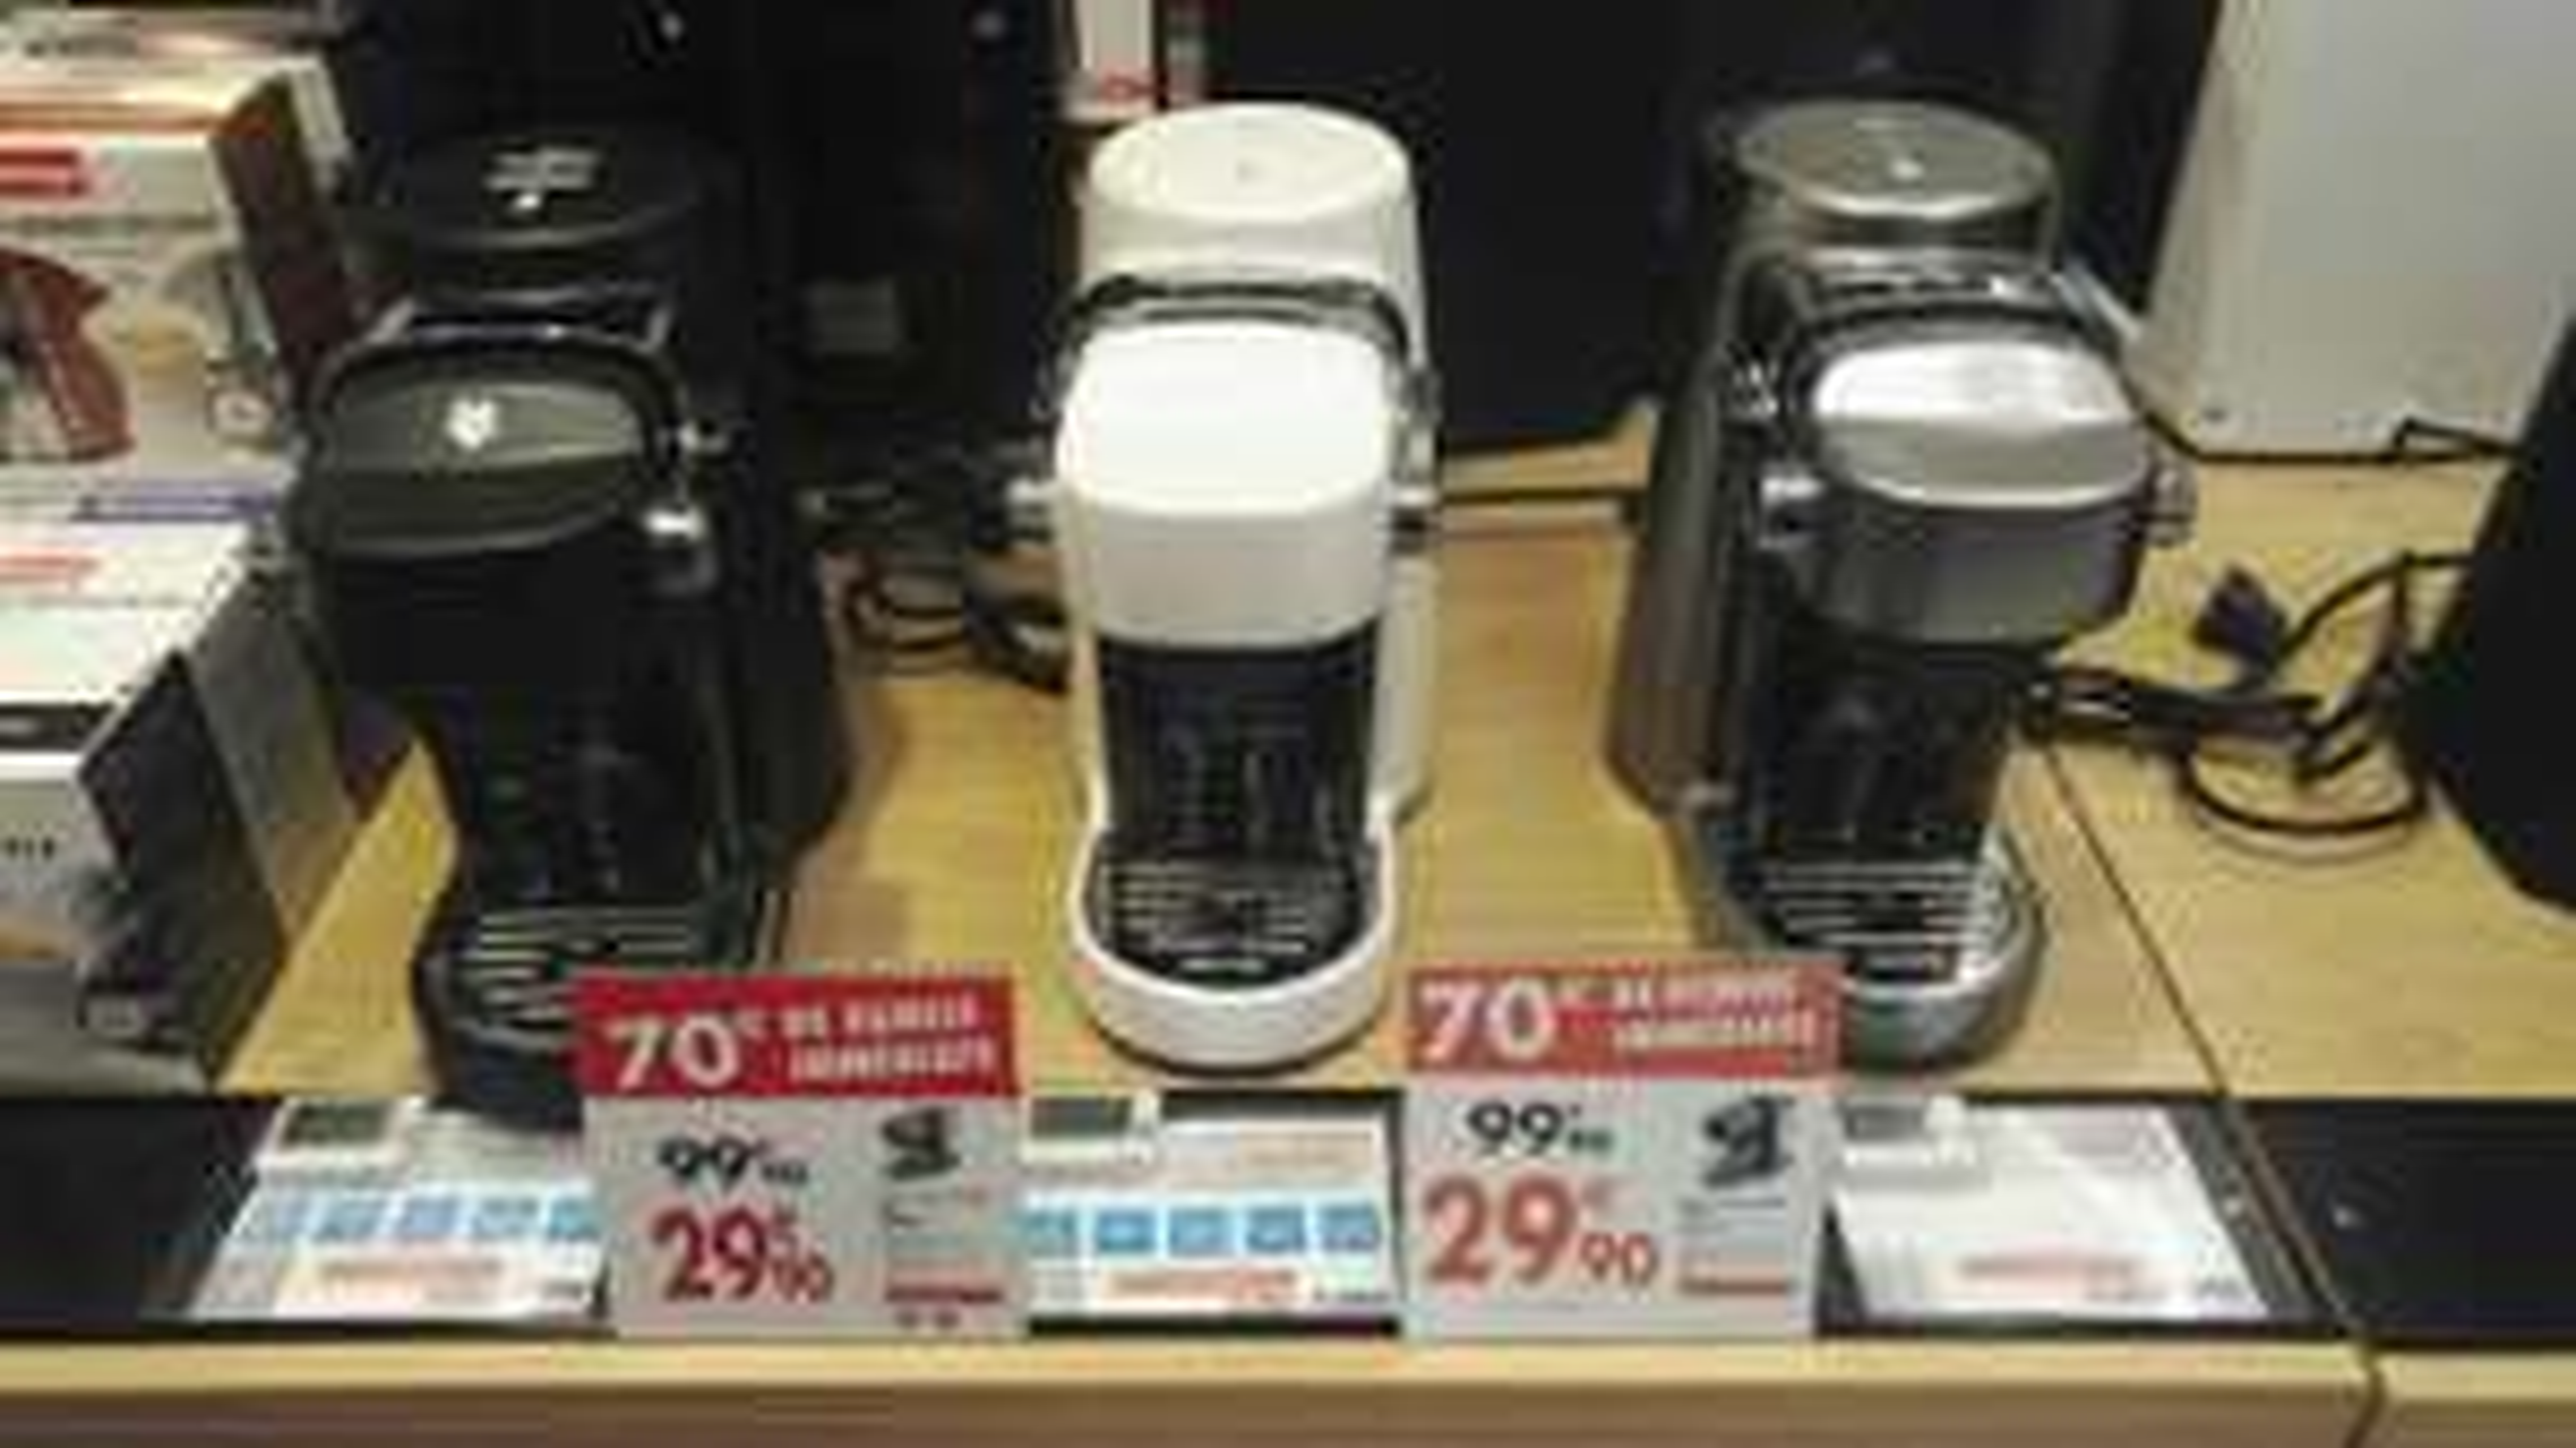 Machine a café Malongo Néoh - Lescar (64)